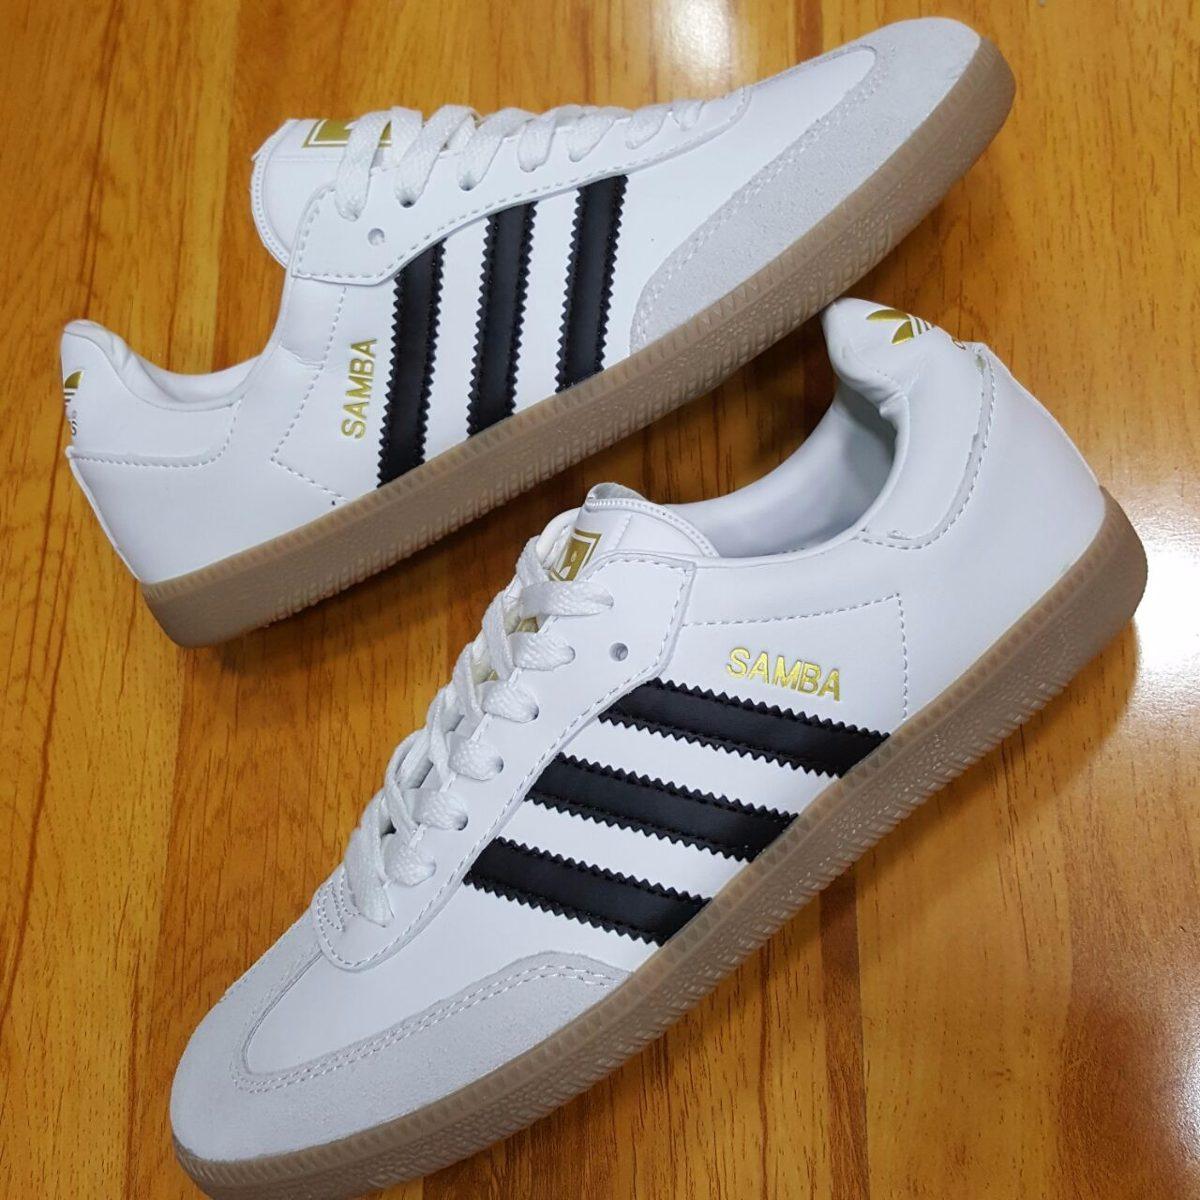 Zapatos blancos Adidas Samba para hombre m0dWSv9Z